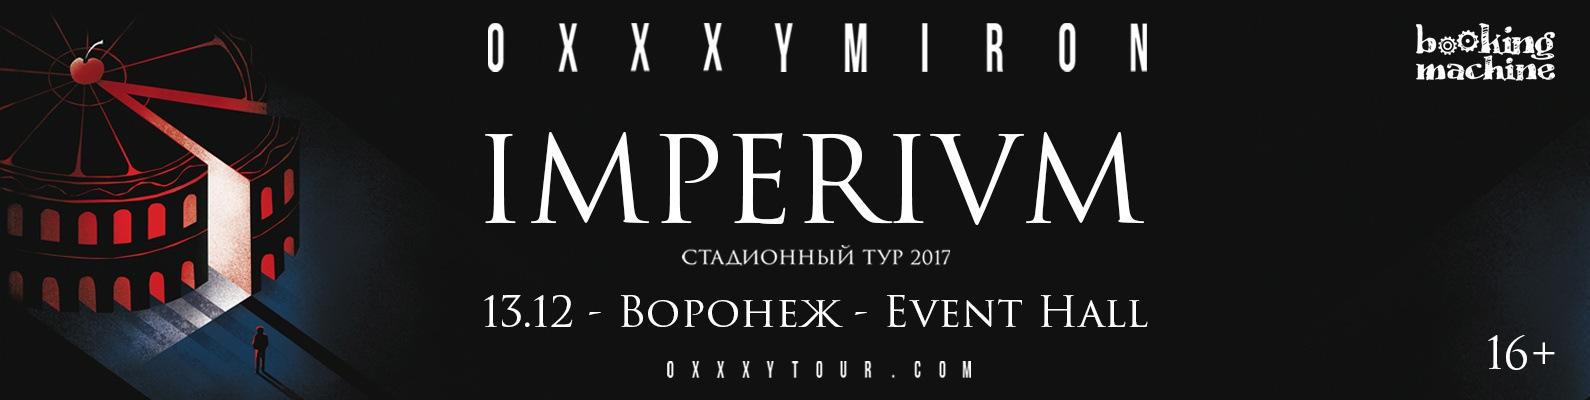 Билеты на концерты воронеж оксимирон краснодар афиша в кино